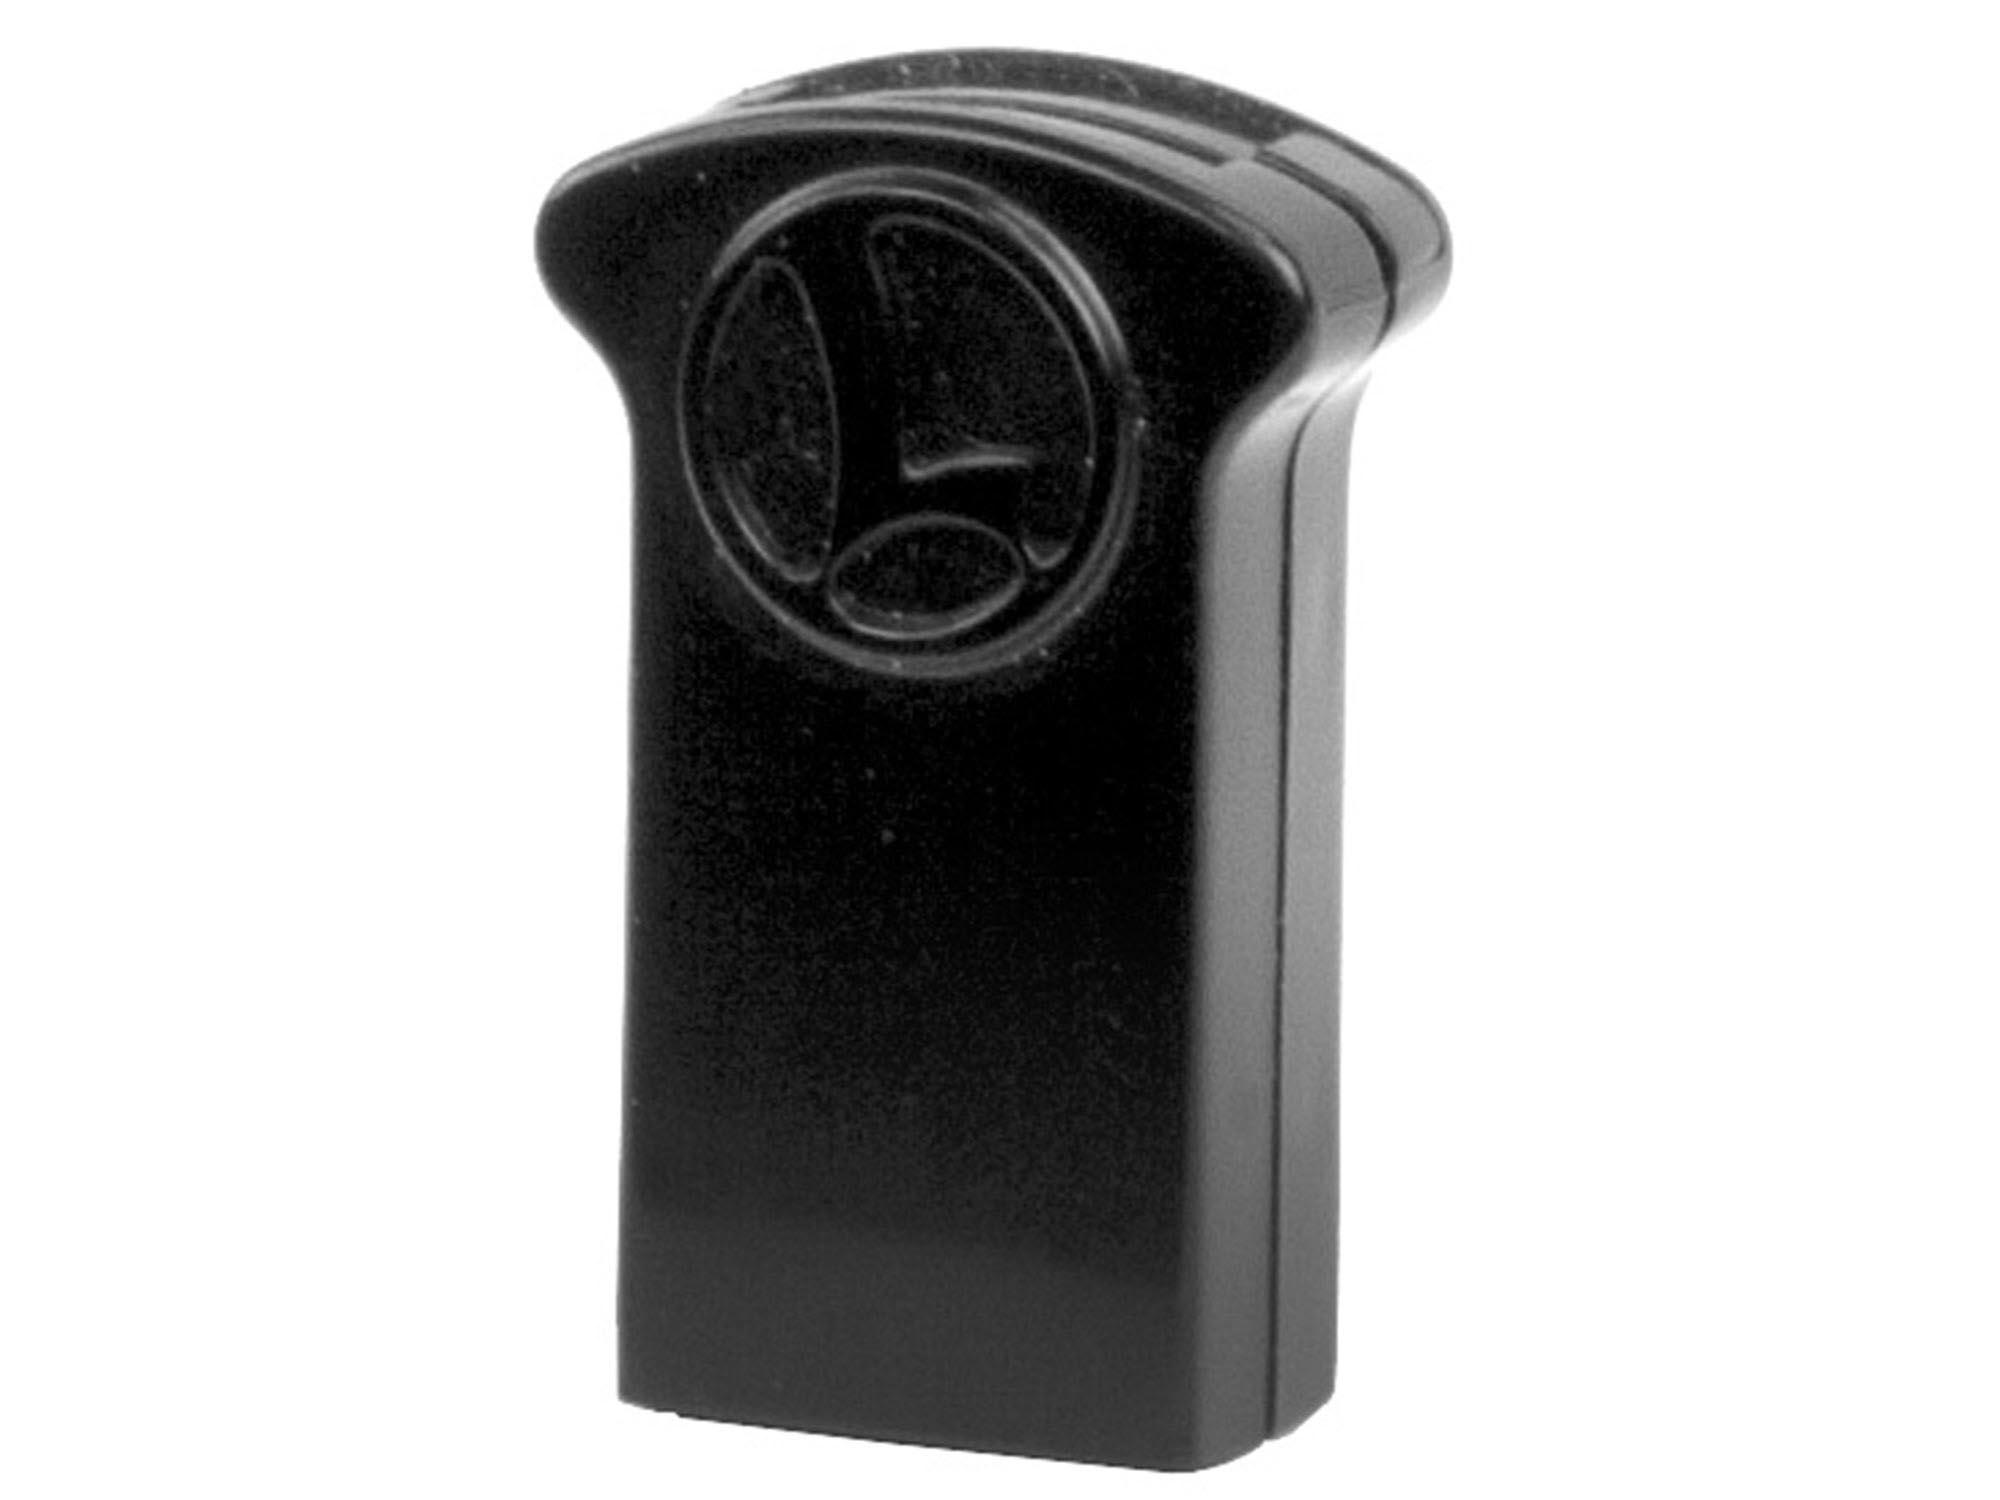 Lionel 637125 Legacy Writable Utility 434-637125 LNL637125